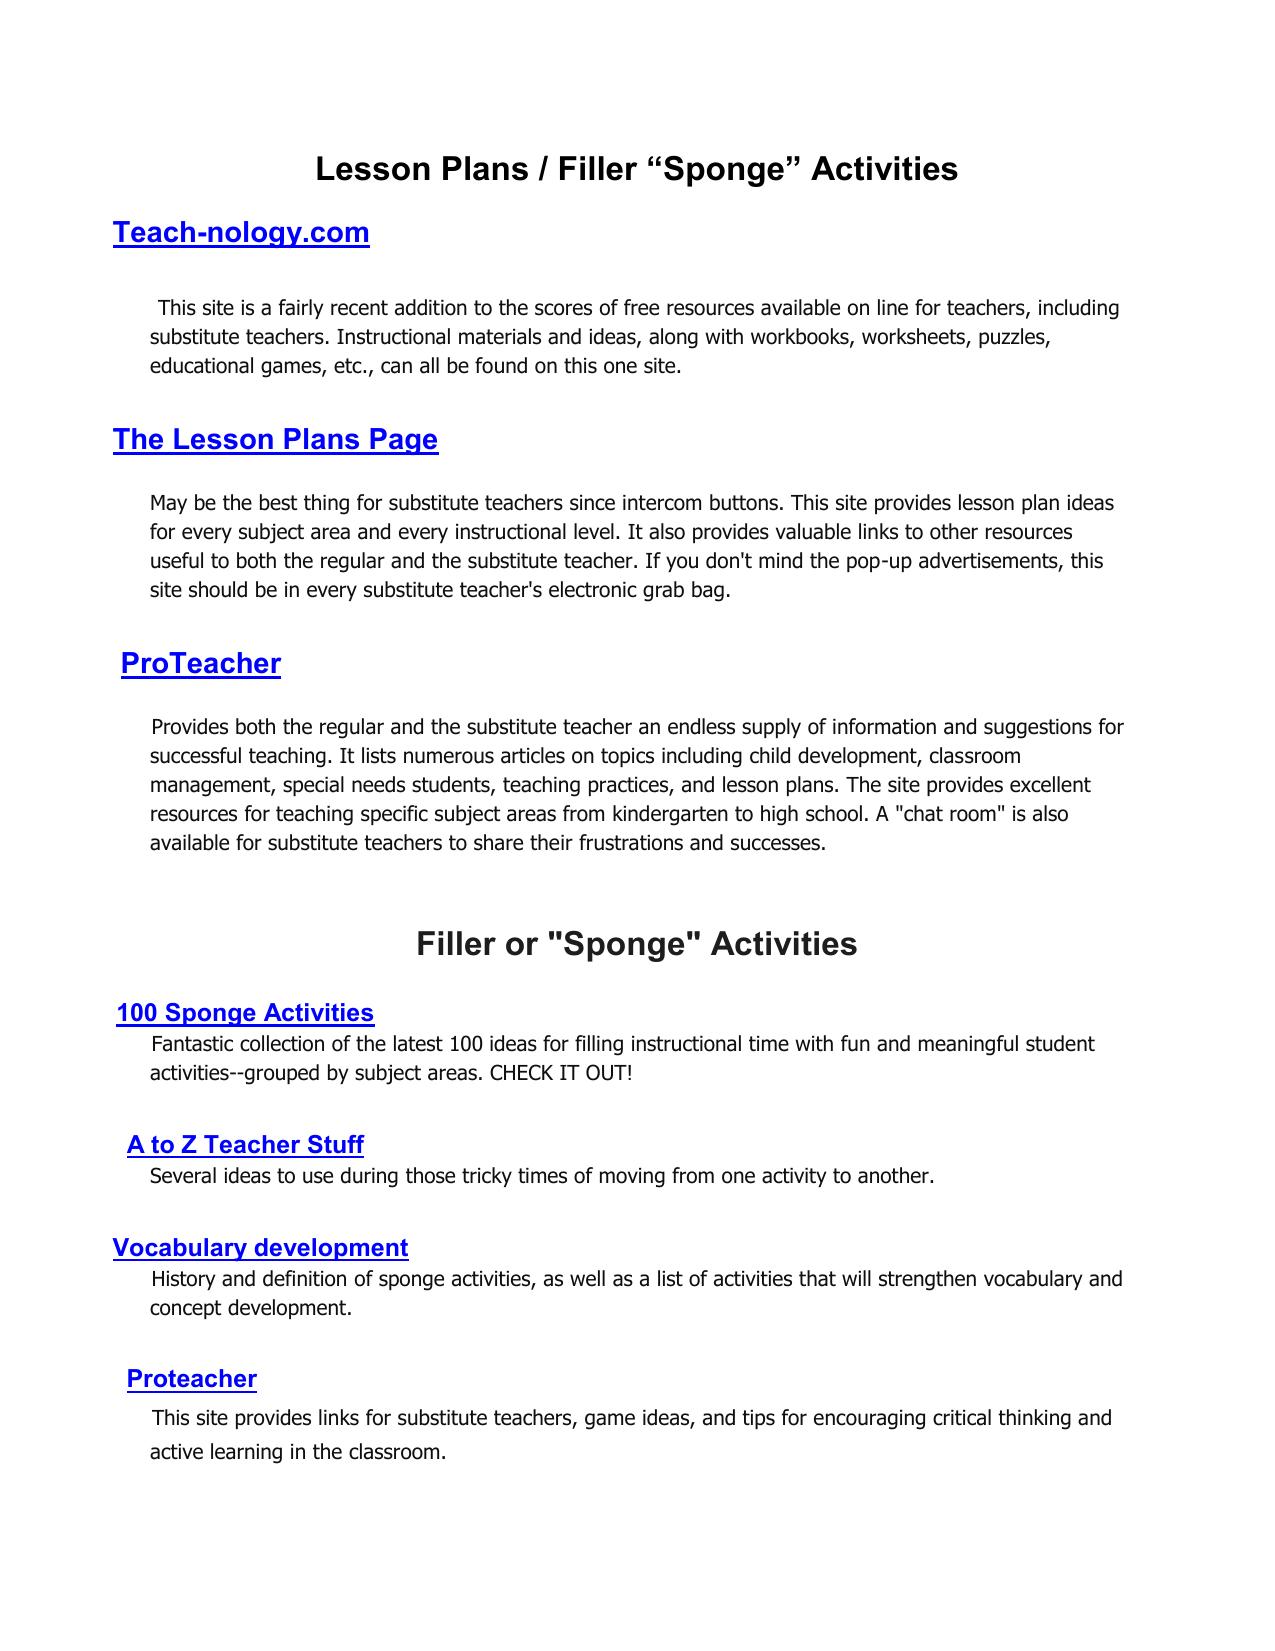 Workbooks teach-nology.com worksheets : Lesson Plan Fillers / Sponge Activities